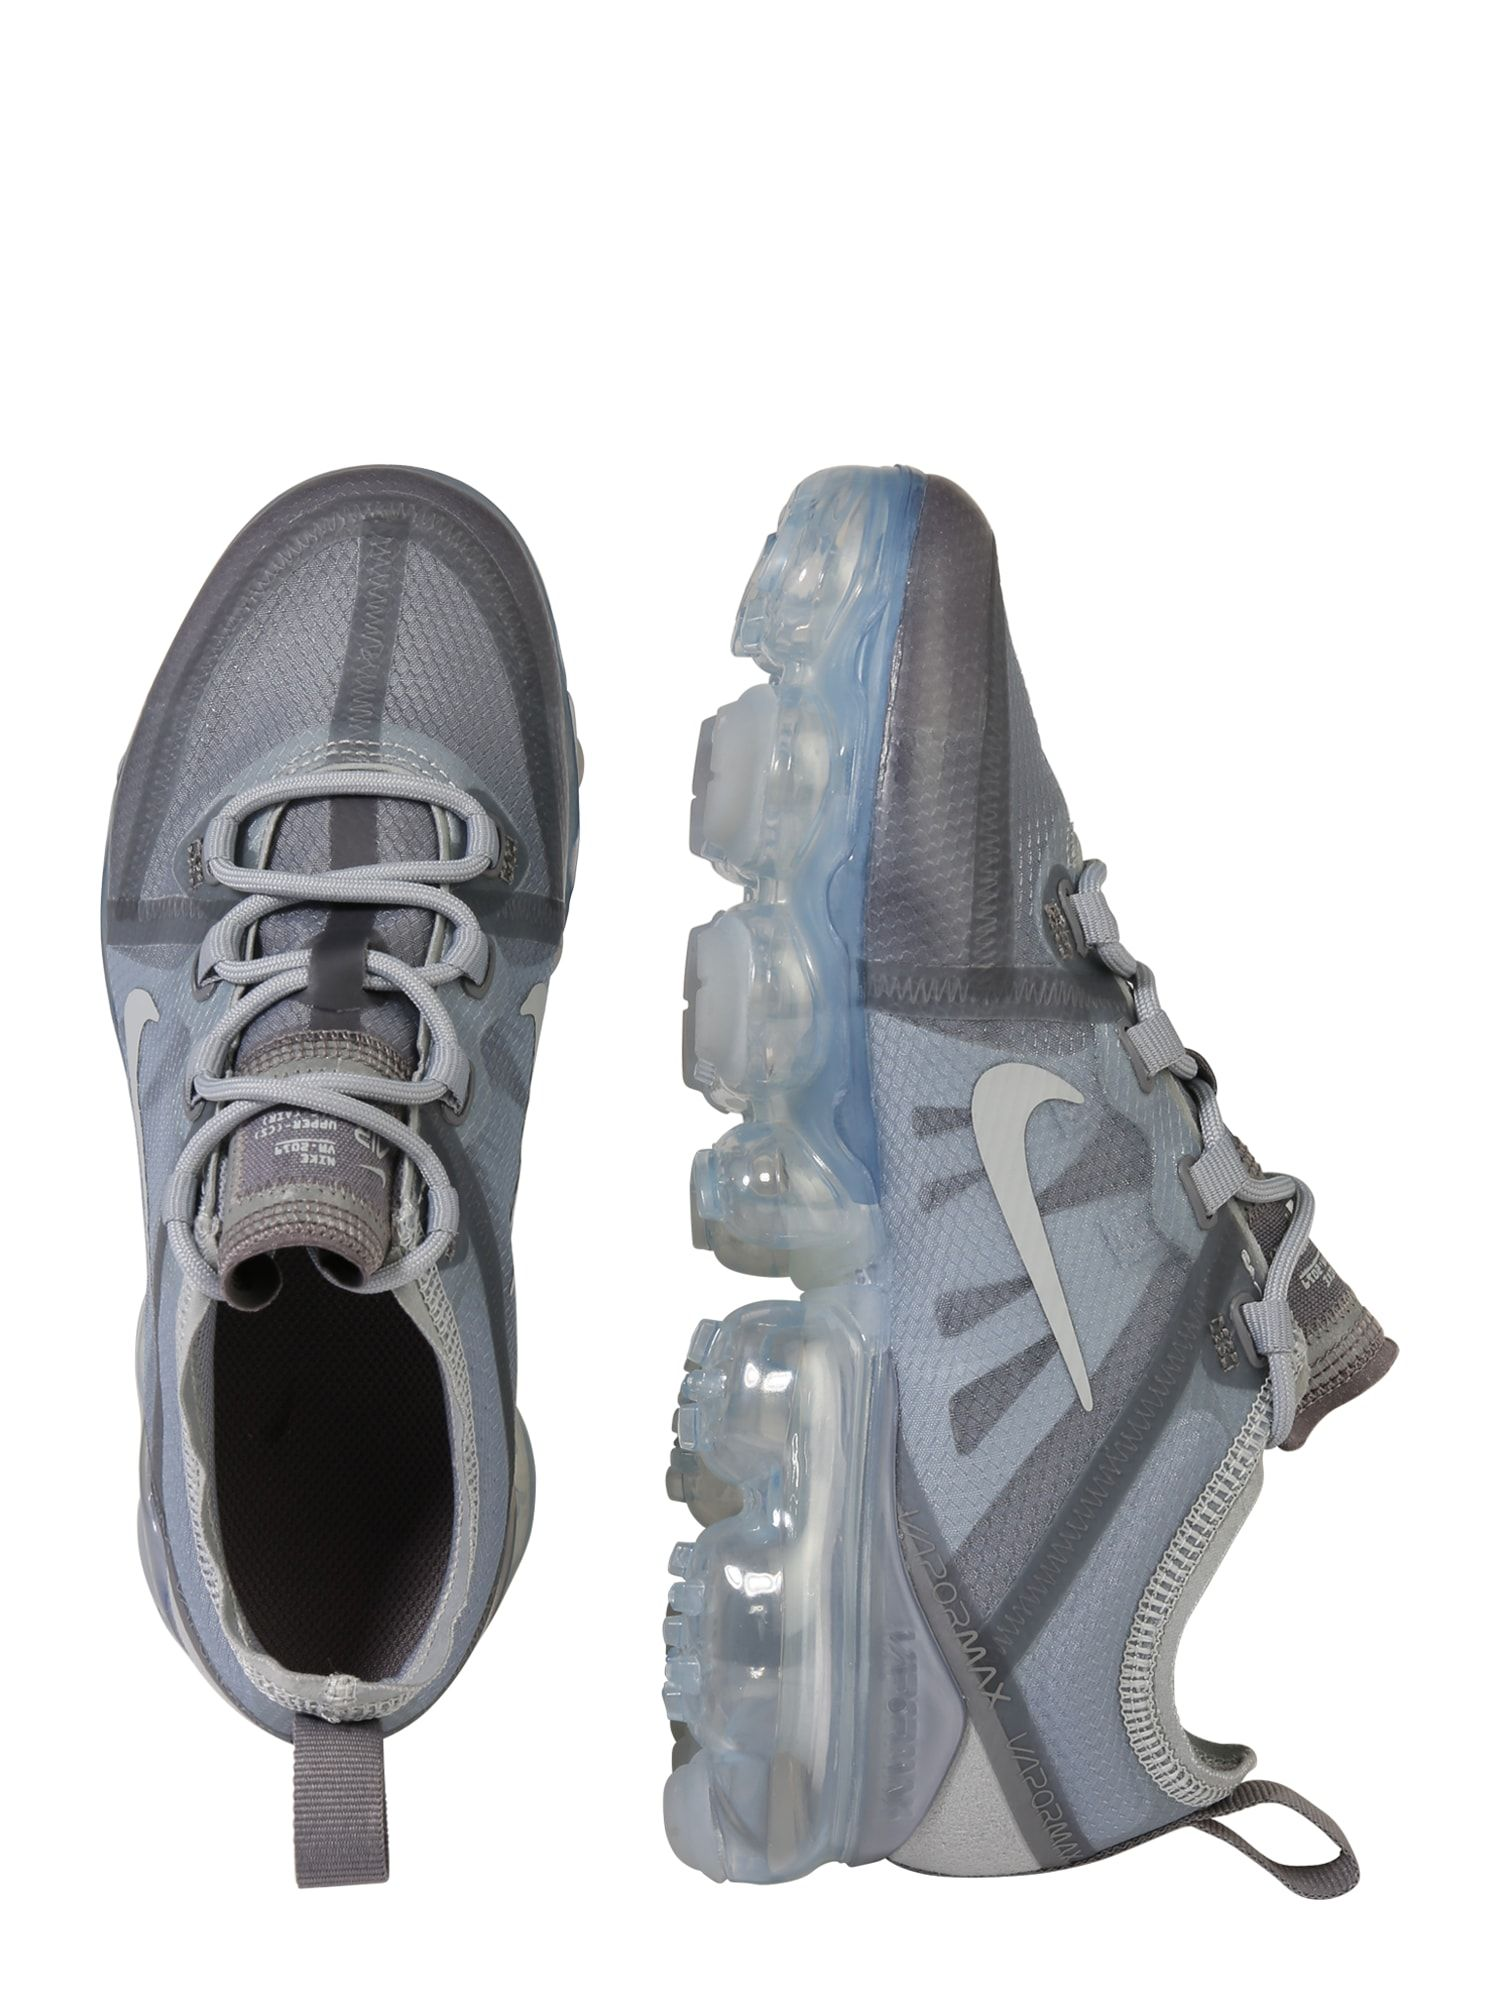 Nike Sportswear Schuhe 'Nike Air VaporMax 2019' Jungen, Grau